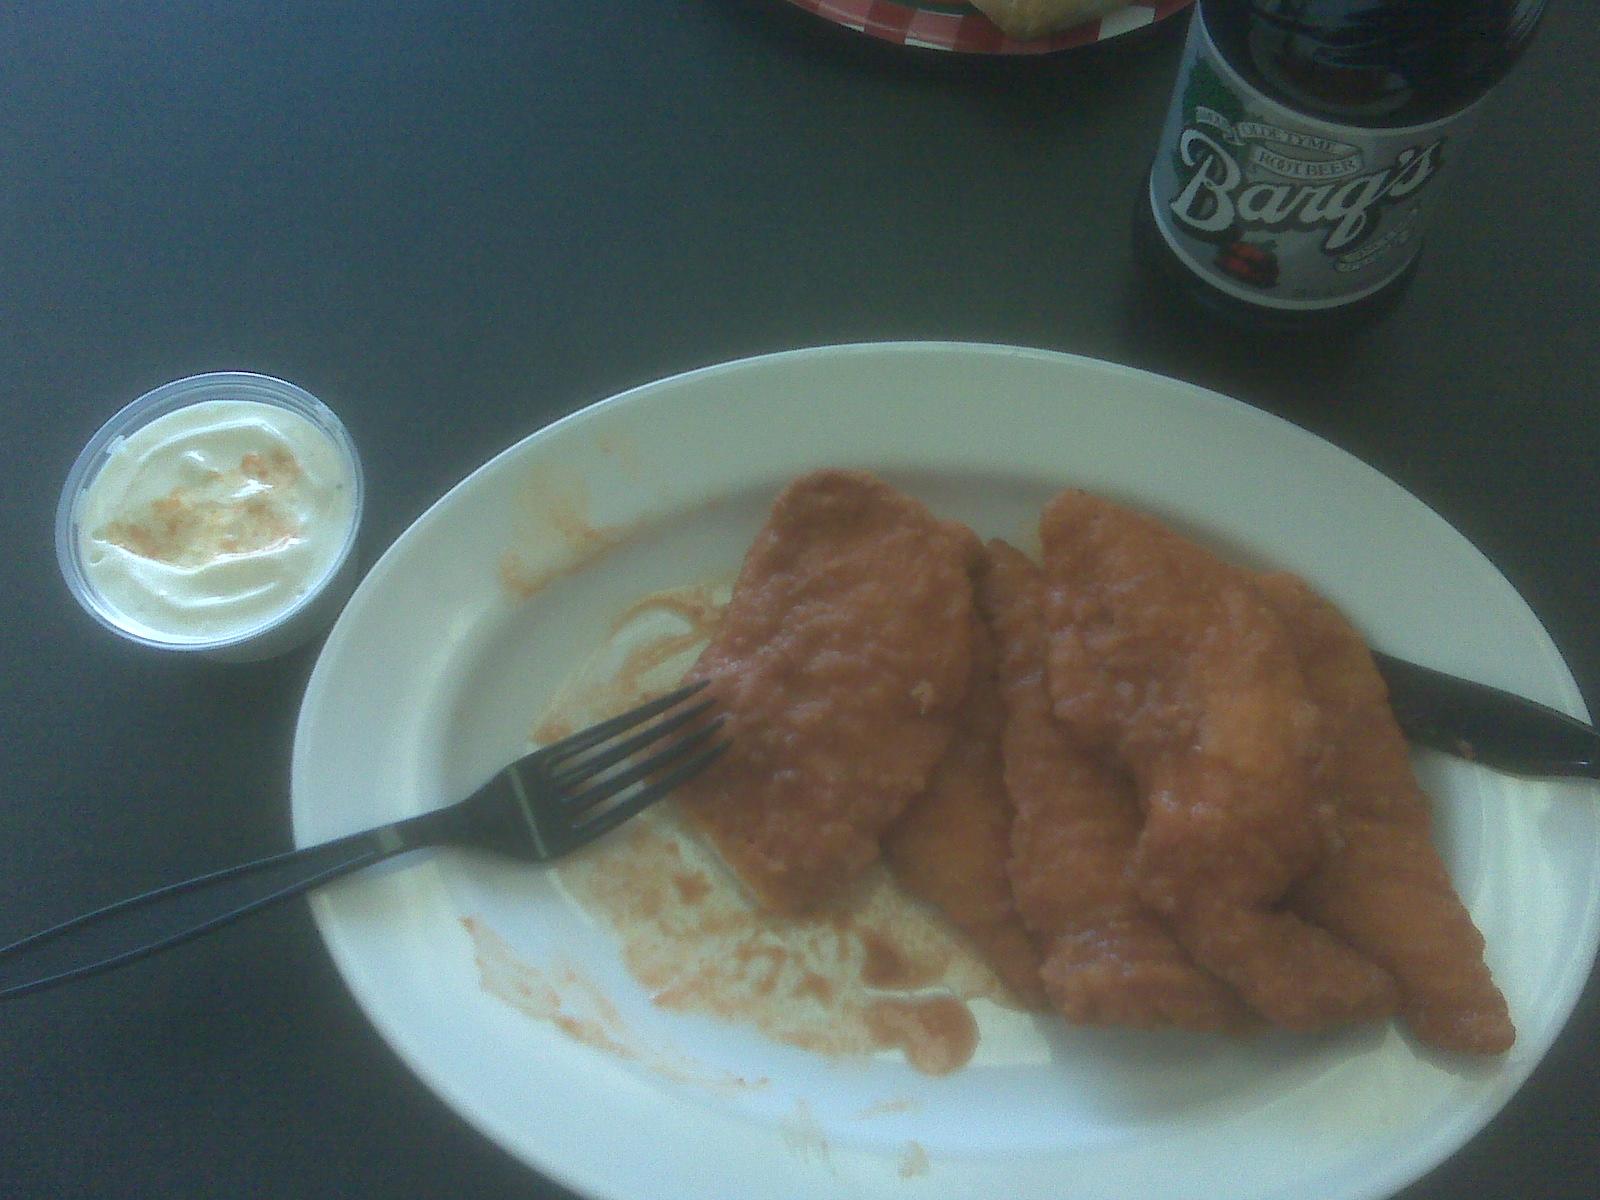 pizza top milford nh :: boneless buffalo wings